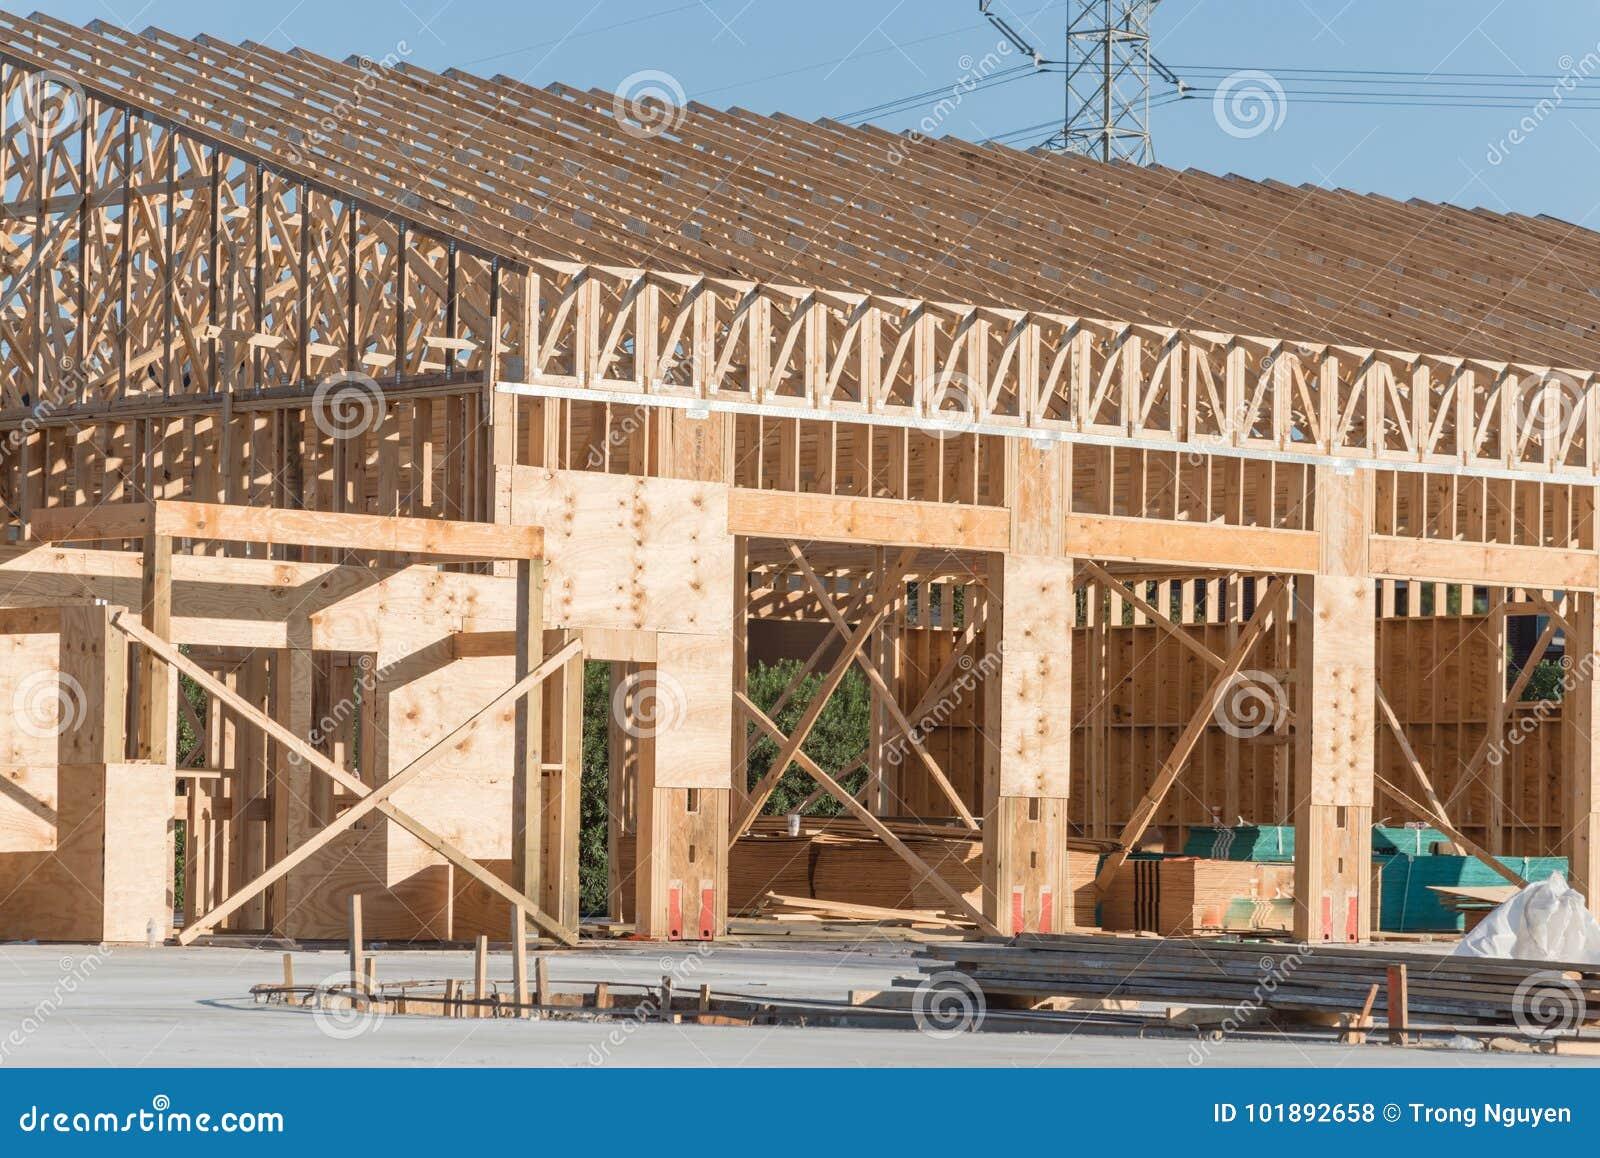 Construcción de edificios comercial de madera